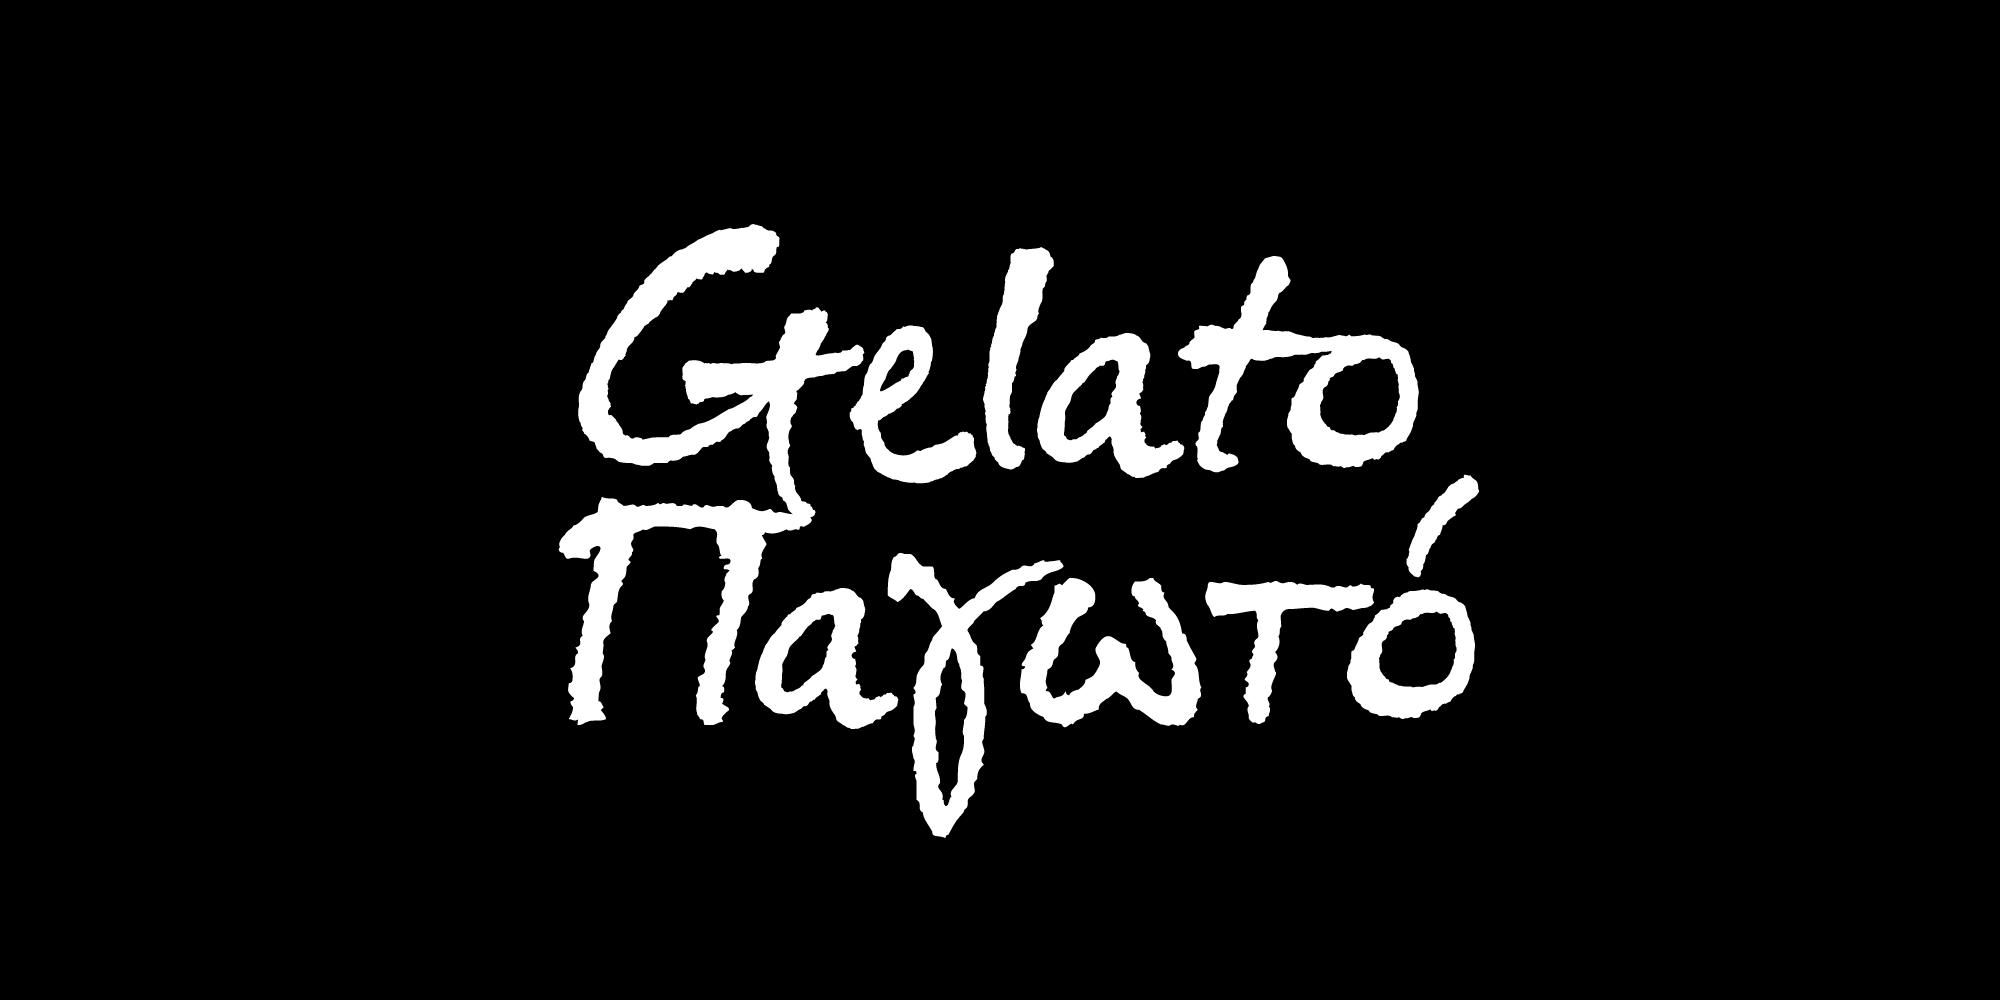 Gelato font nameplate